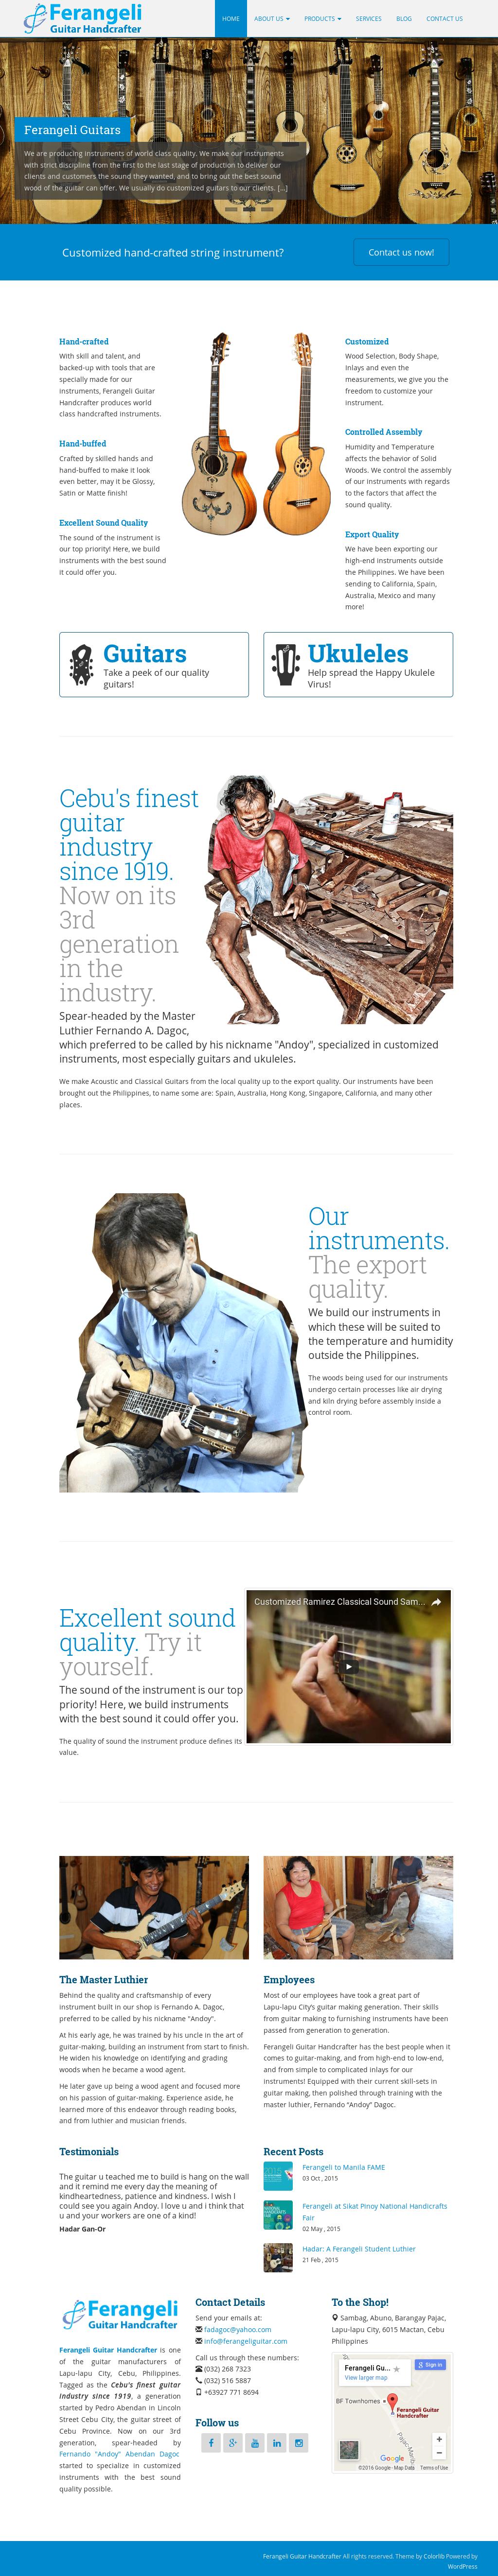 Ferangeli Guitar Handcrafter Competitors, Revenue and Employees